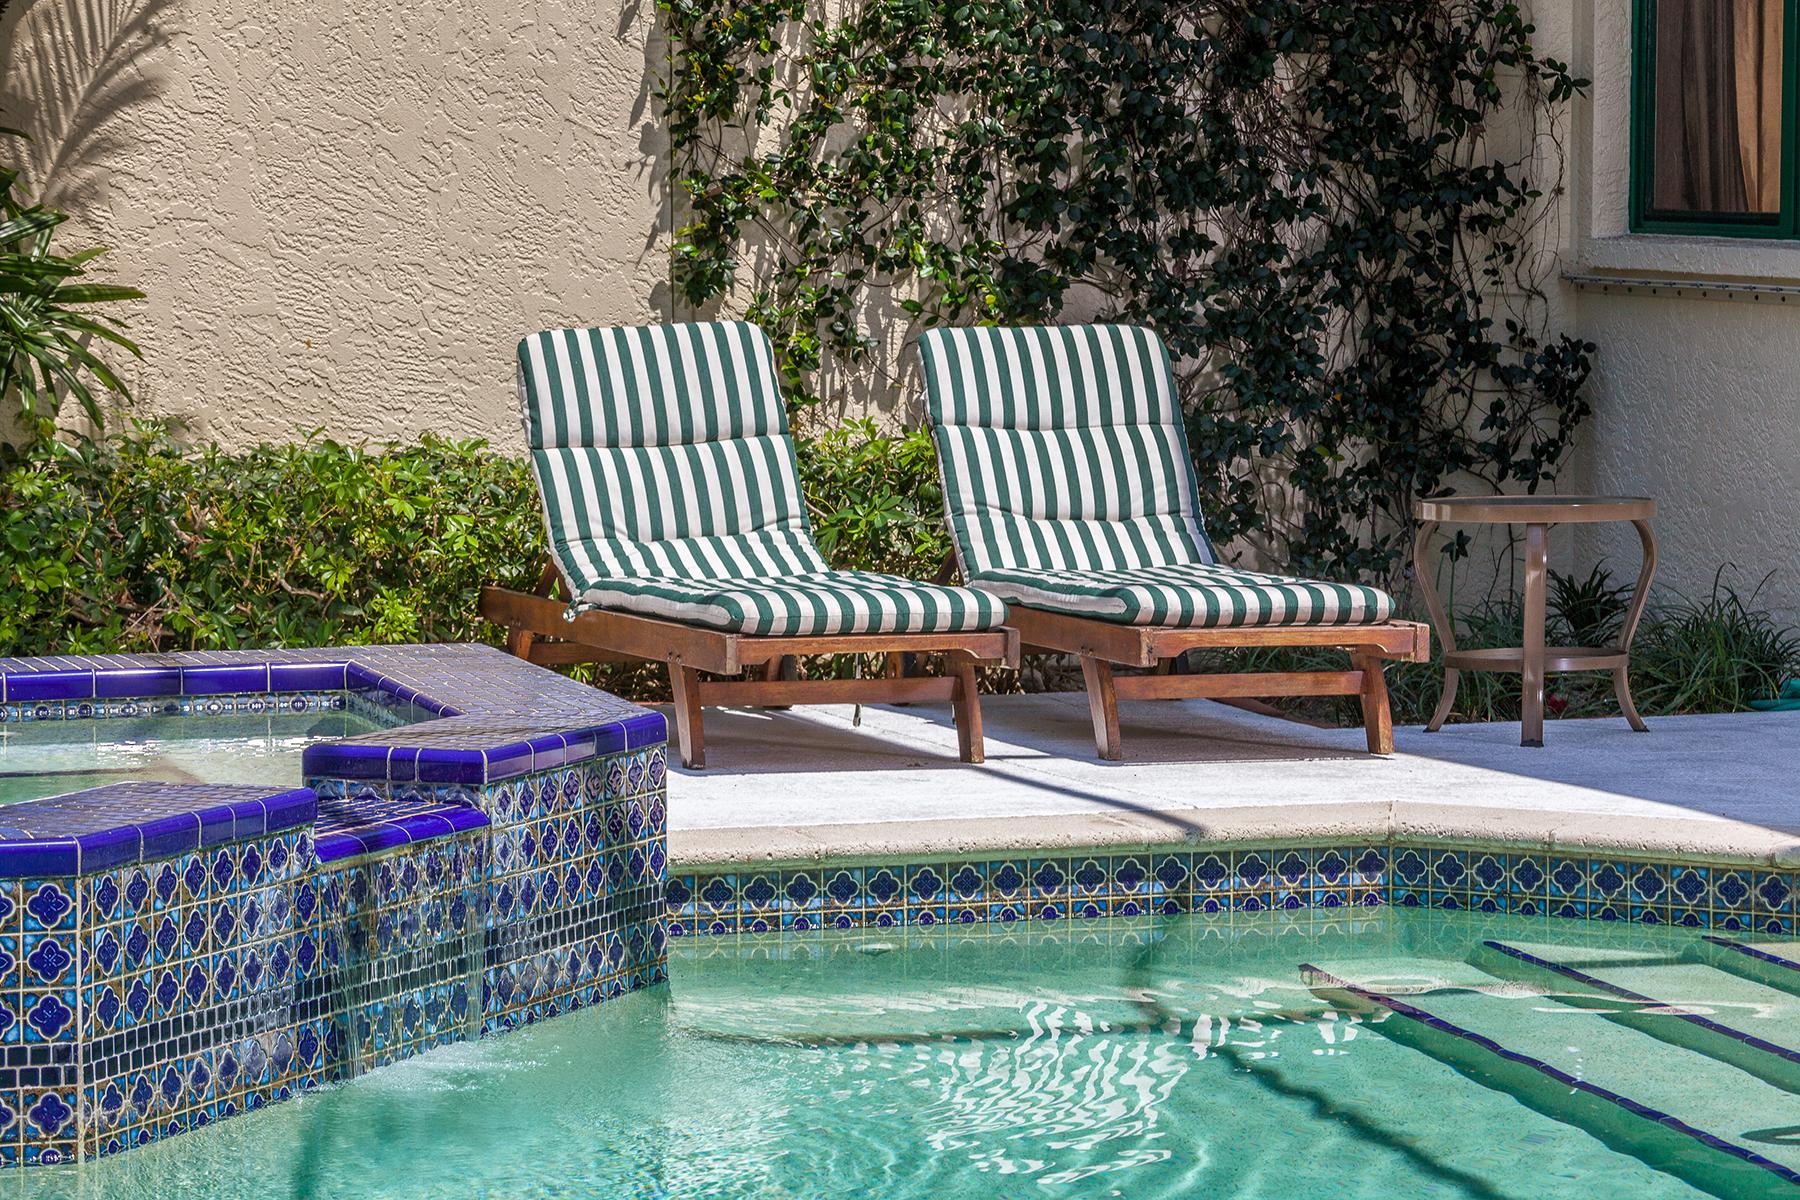 Additional photo for property listing at PELICAN BAY - VIZCAYA AT BAY COLONY 7855  Vizcaya Way,  Naples, Florida 34108 United States